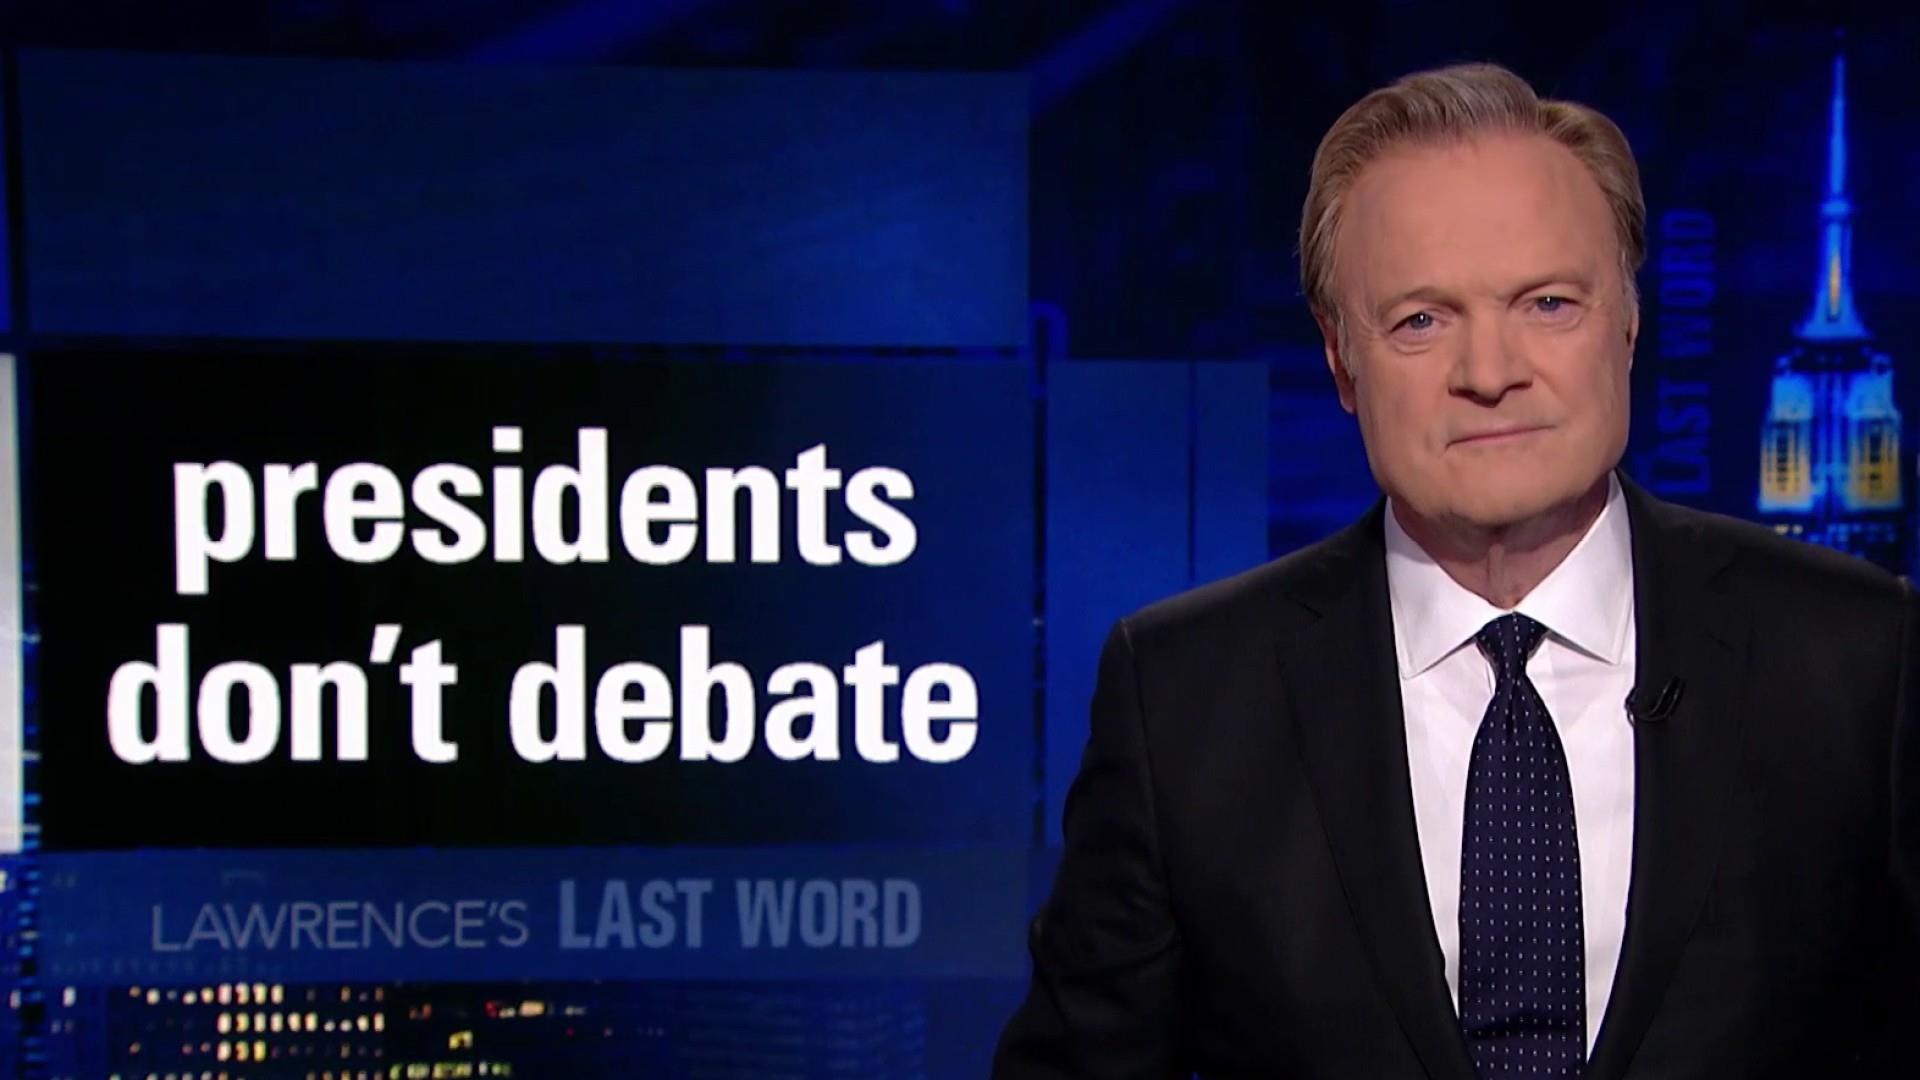 Lawrence's Last Word: presidents don't debate